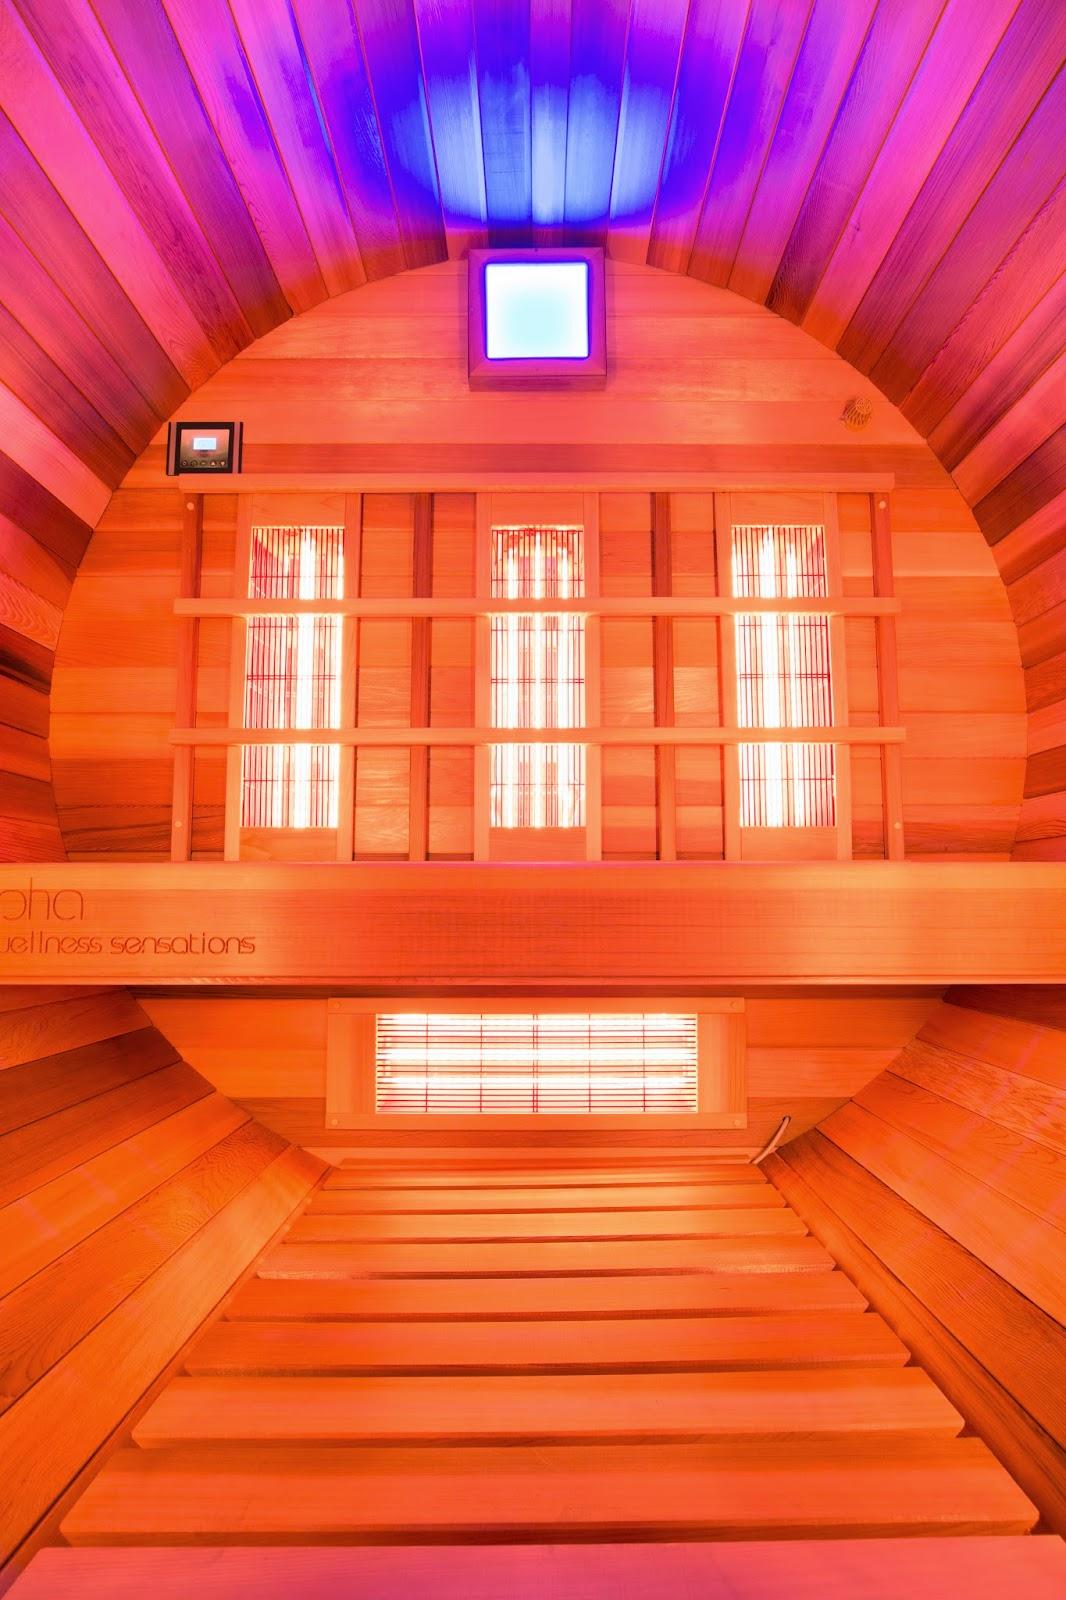 BIQO3 - Barrel - Infrared - Quartz - Outdoor - Benches, backrest, flooring in cedar wood